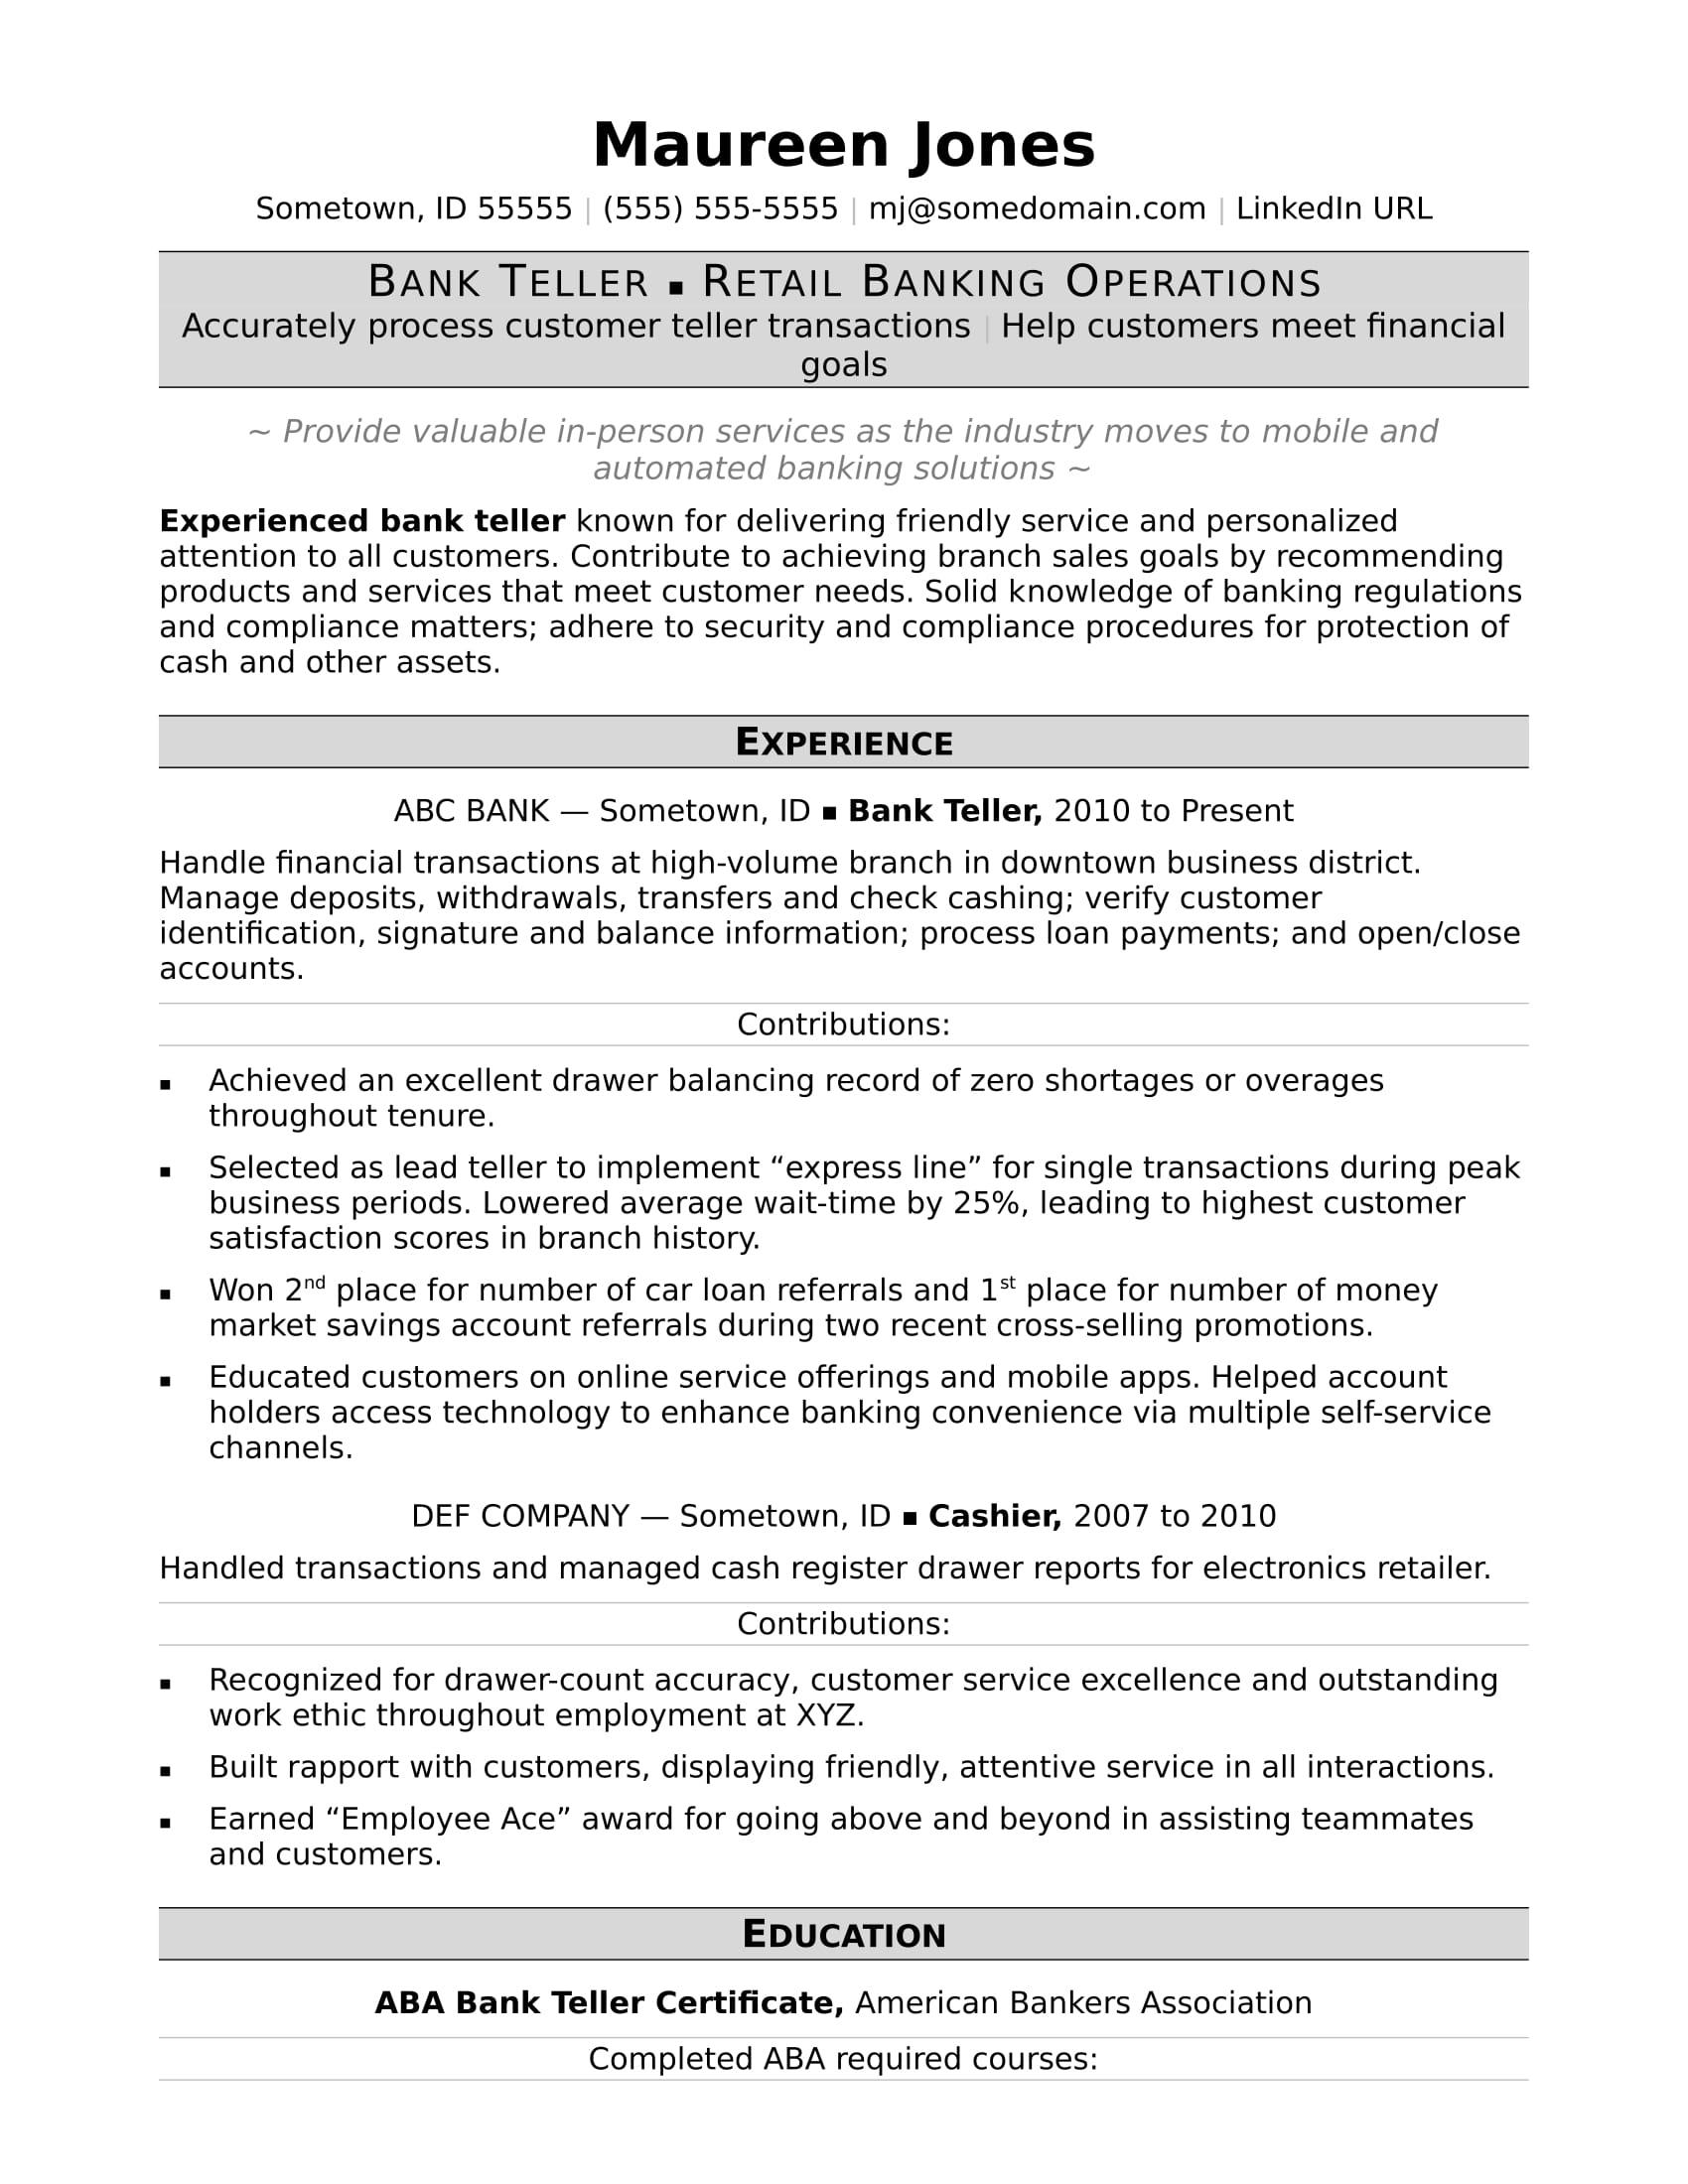 sample resume for relationship manager in bank